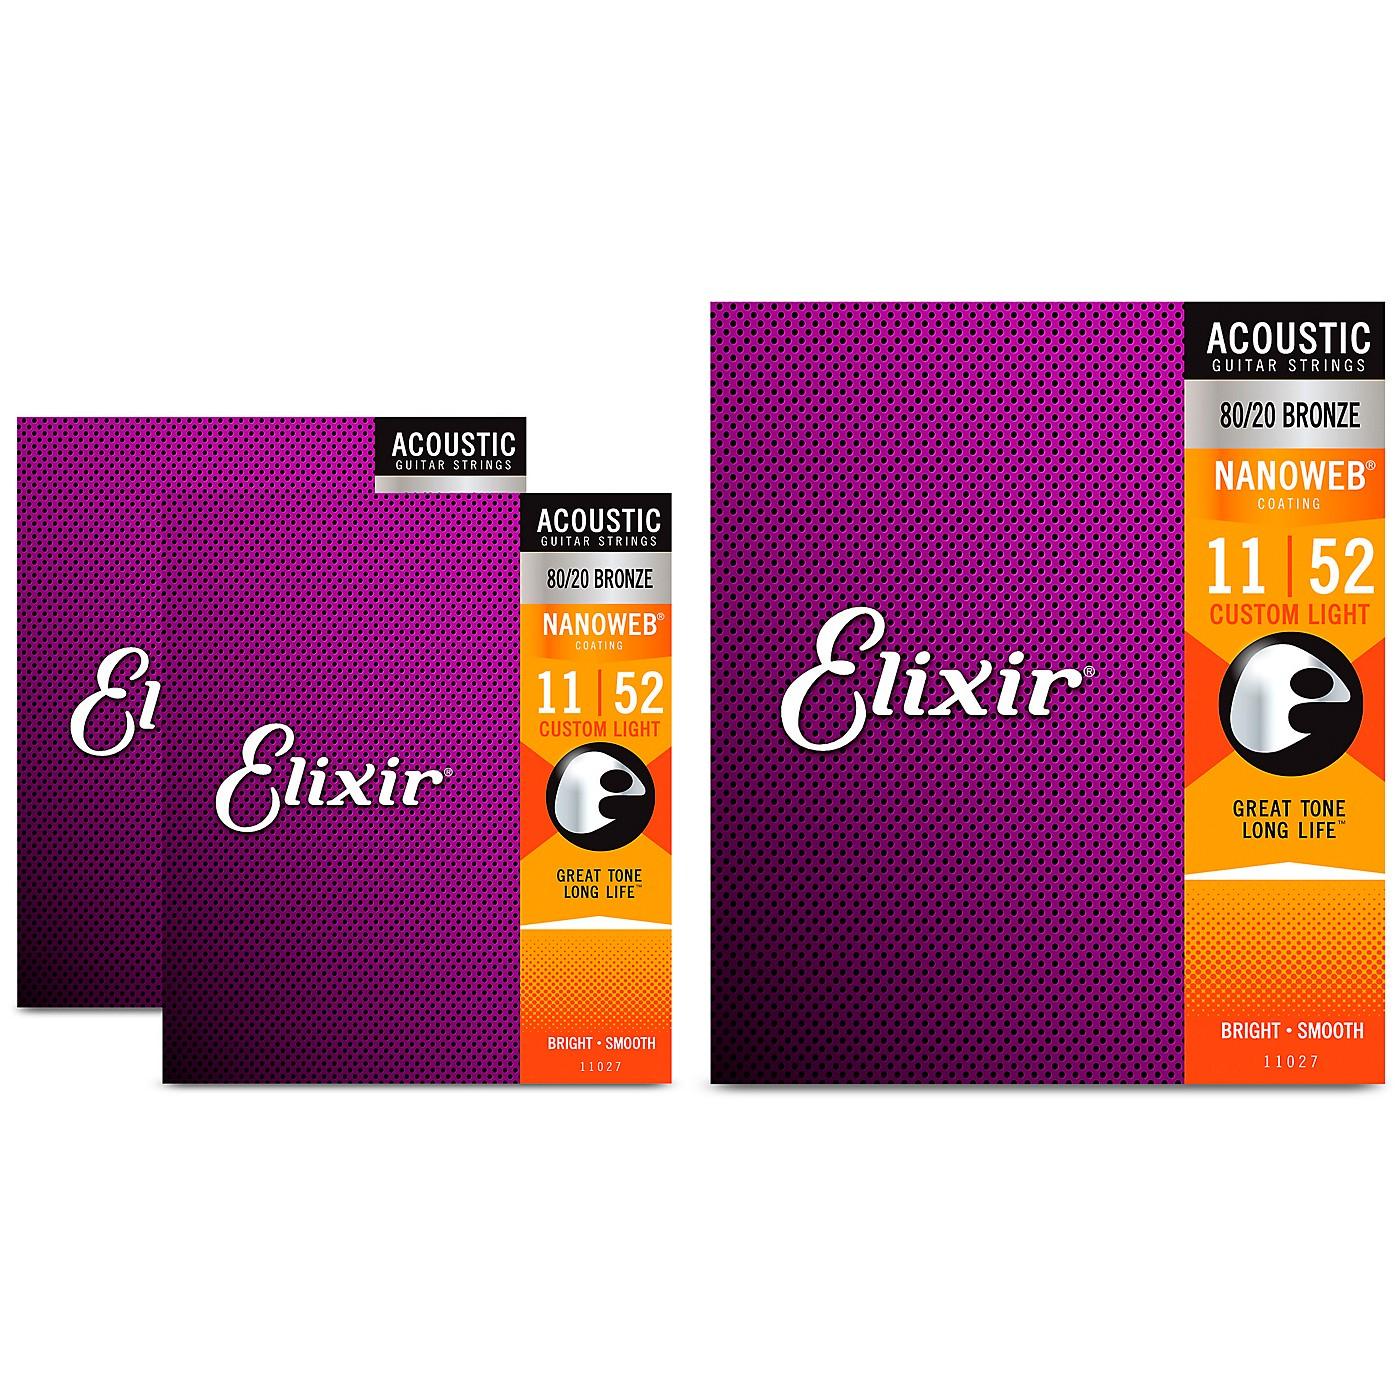 Elixir Nanoweb Custom Light Acoustic Guitar Strings 3 Pack thumbnail